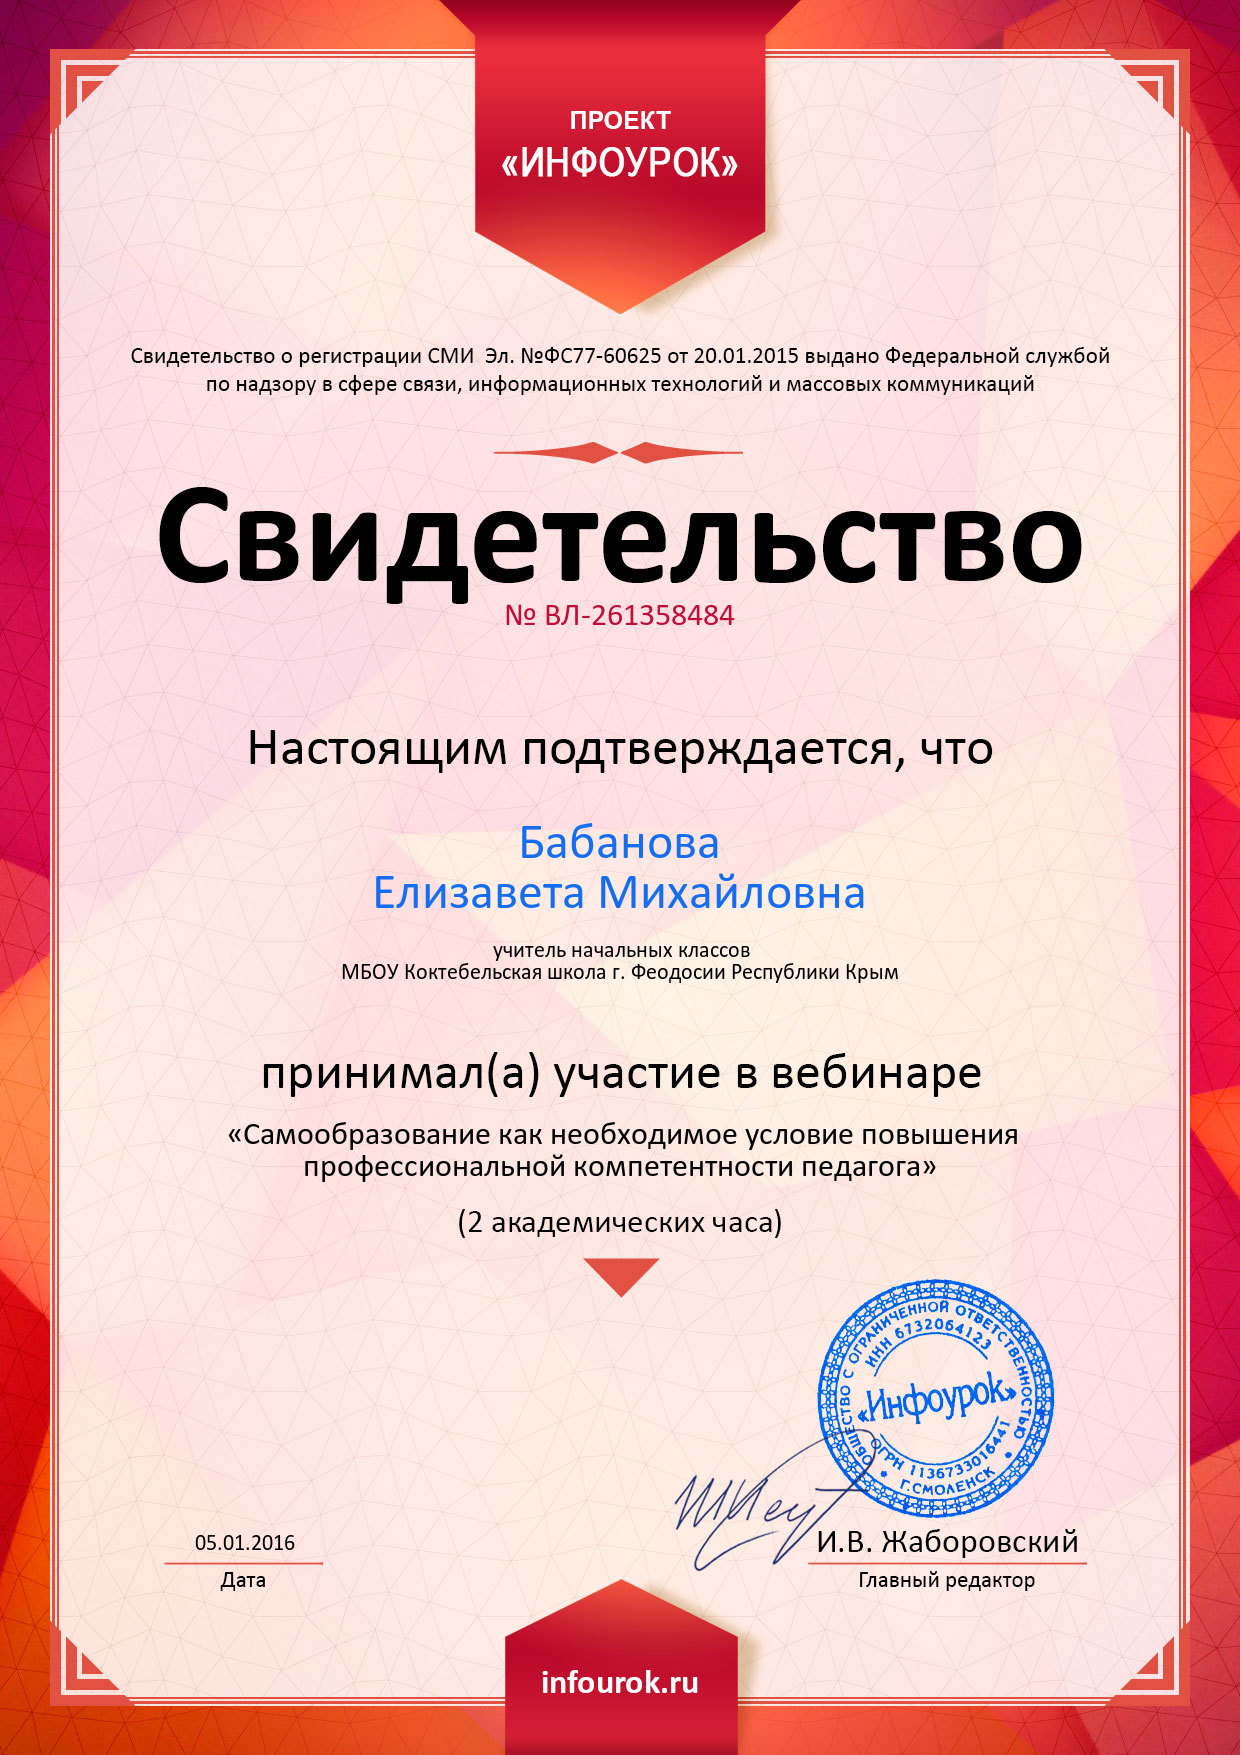 C:\Users\Elizaveta\Desktop\аттестация Бабанова\Лиза сертификаты\Свидетельство проекта infourok.ru № ВЛ-261358484.jpg